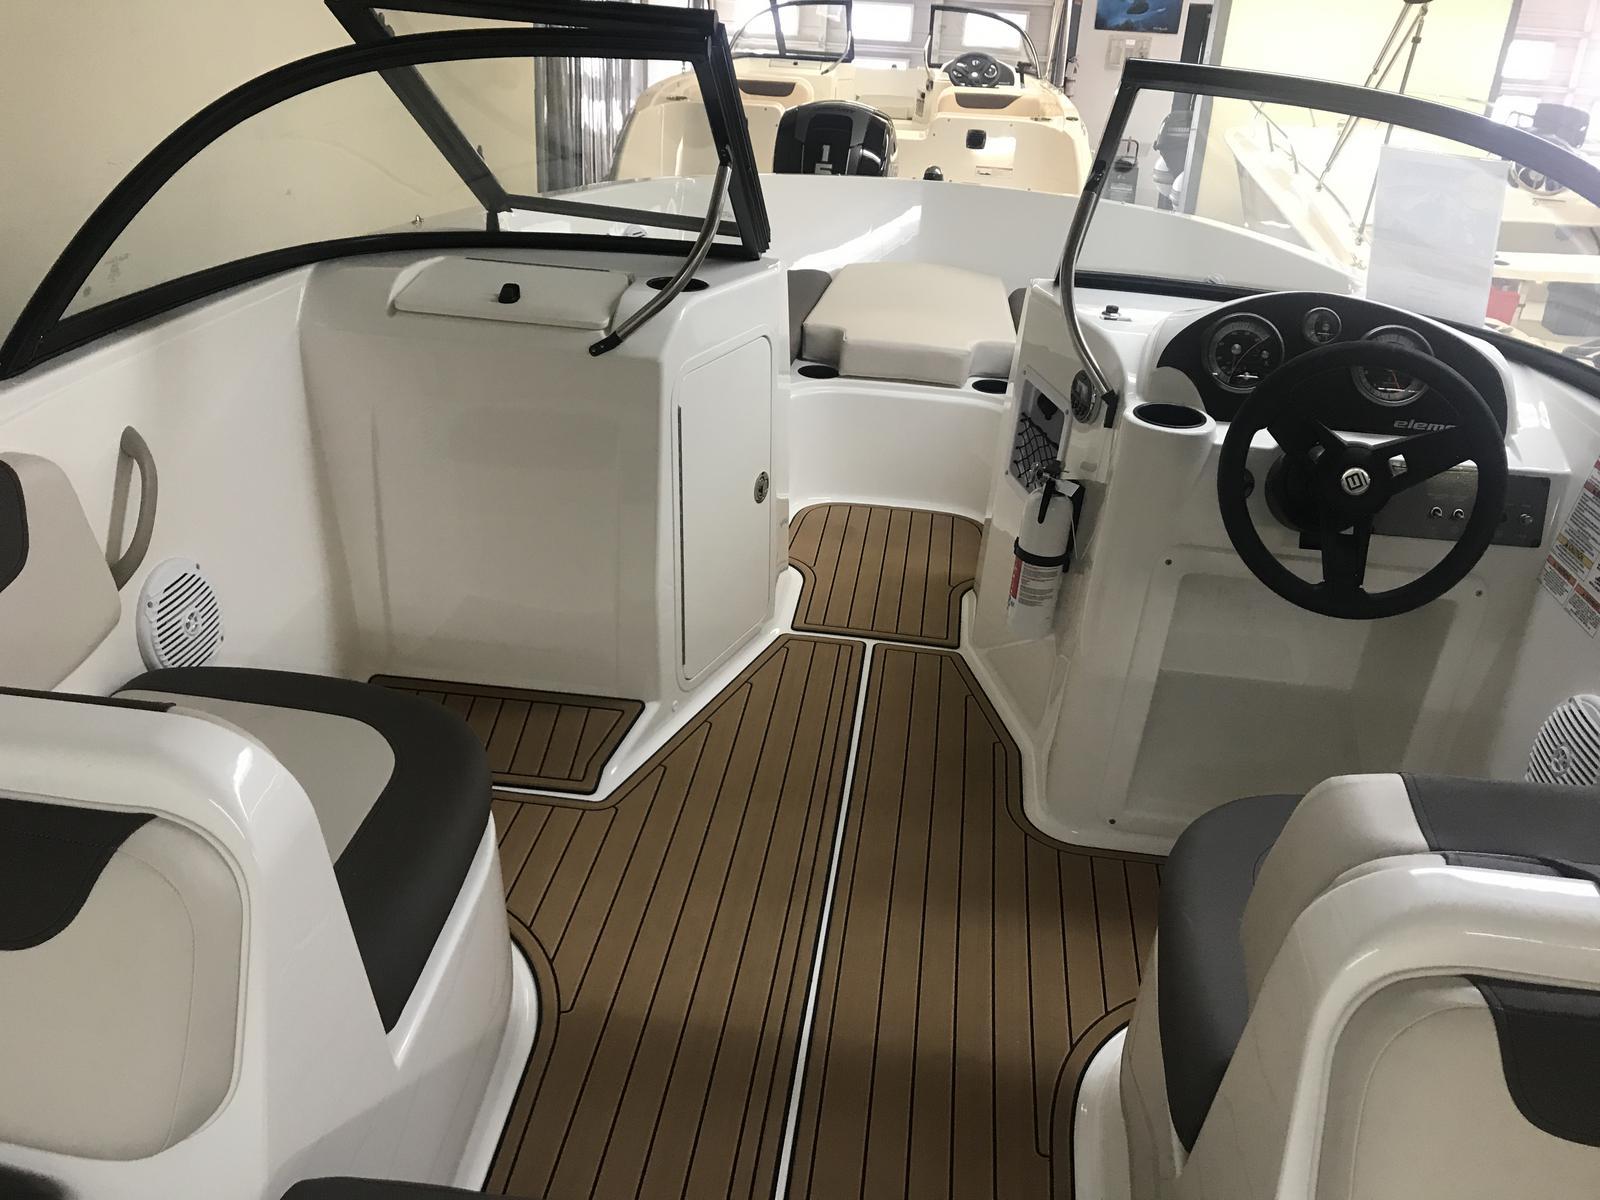 2019 Bayliner boat for sale, model of the boat is Element E21 & Image # 2 of 22